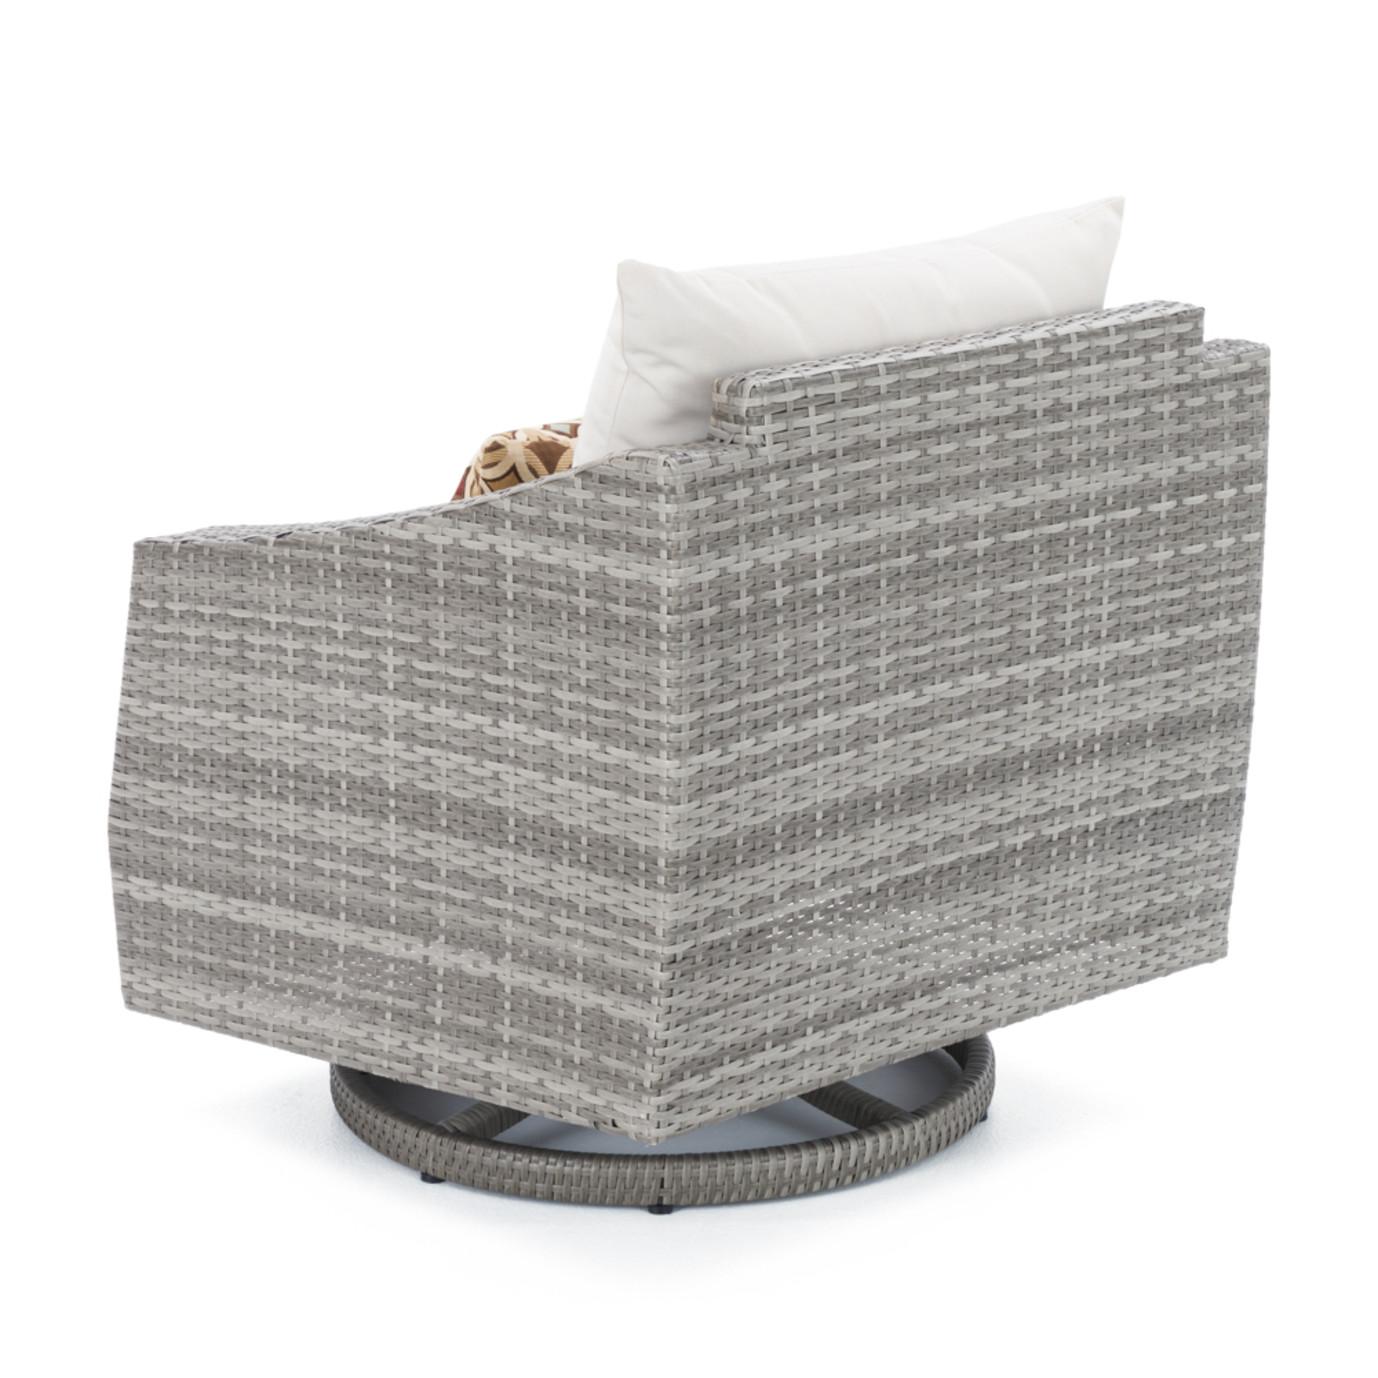 Cannes™ Deluxe 8pc Sofa & Club Chair Set - Moroccan Cream